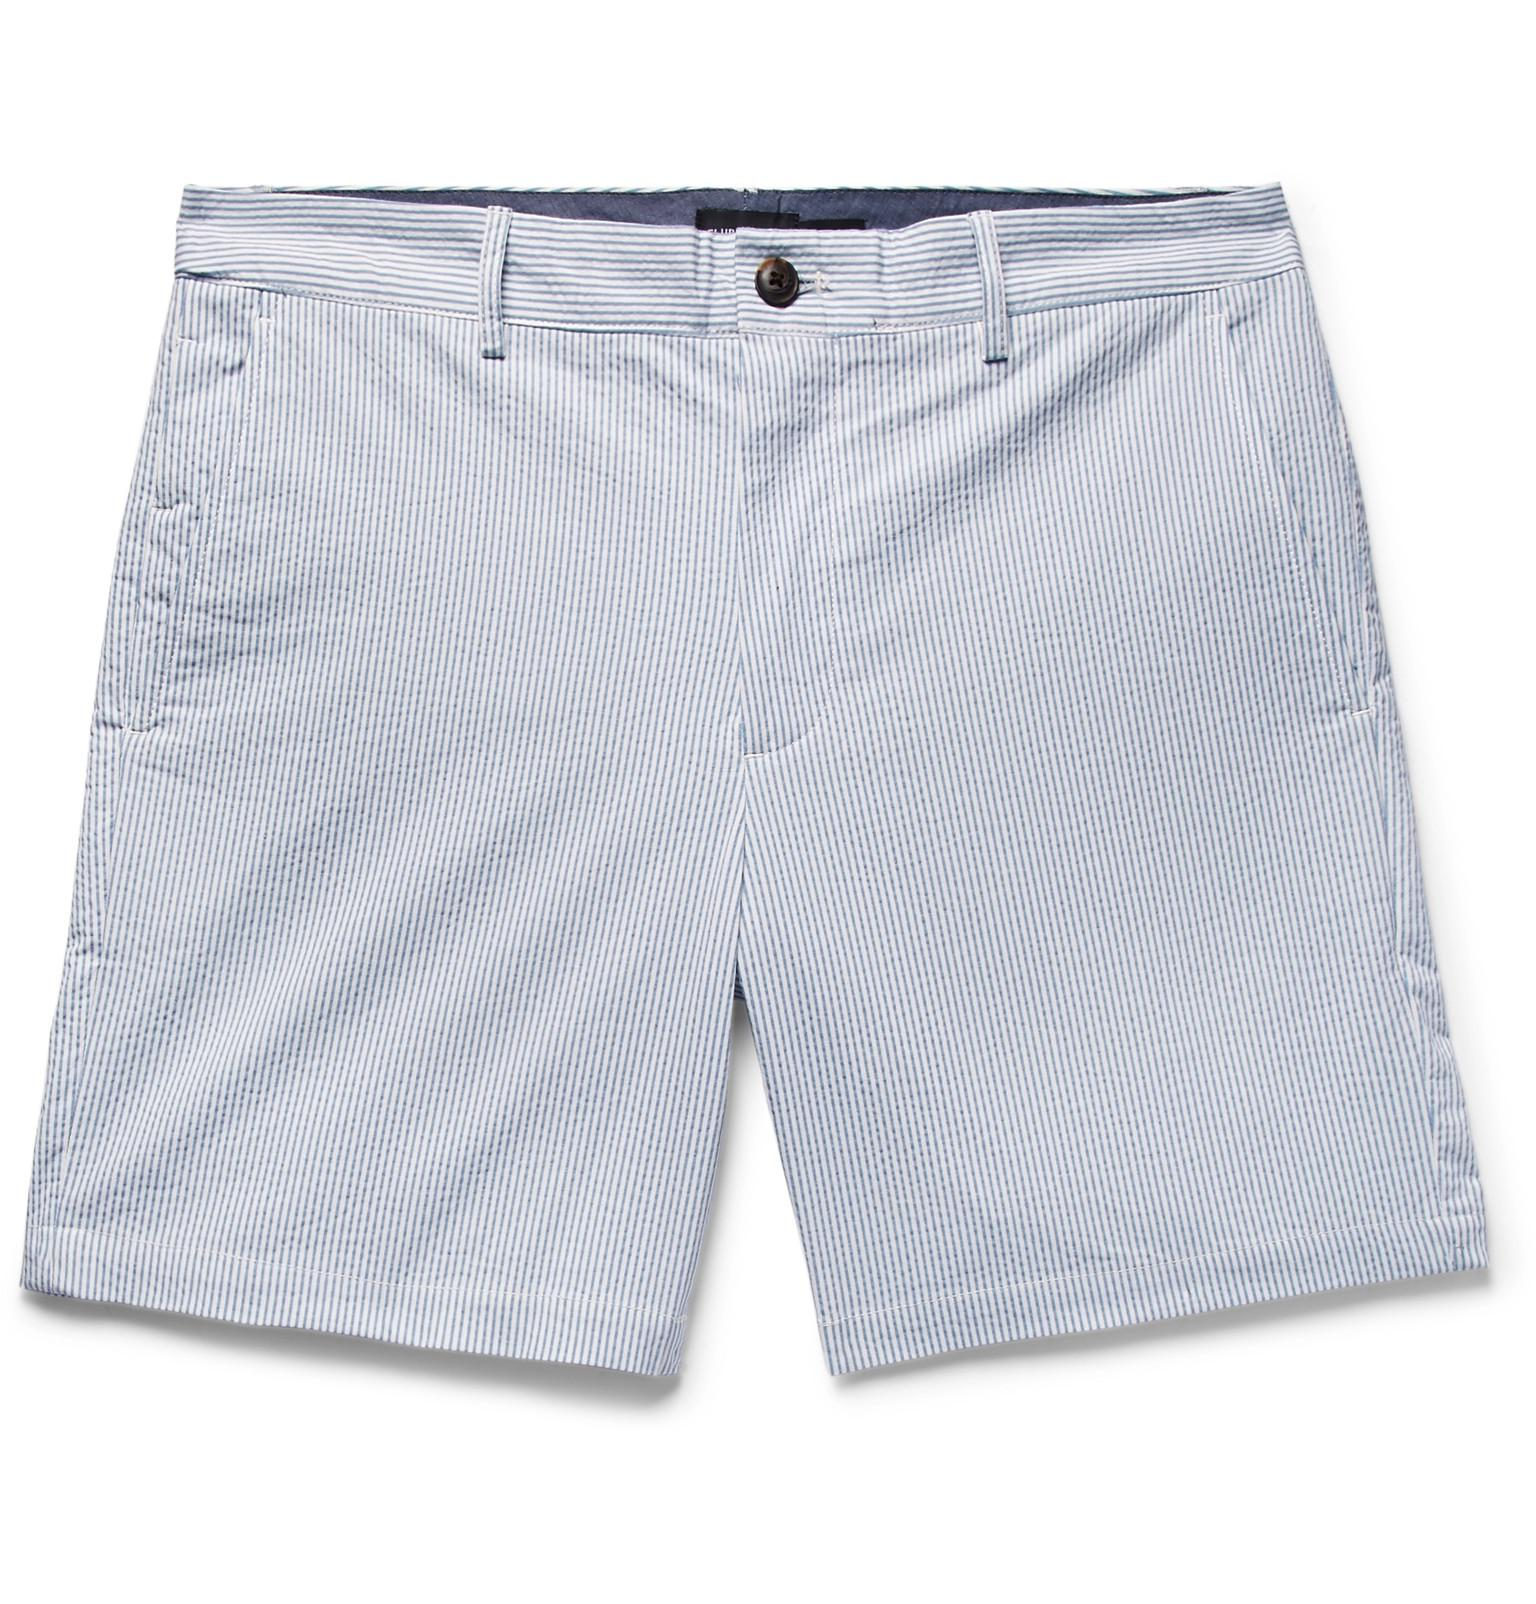 Baxter Slim-fit Stretch Linen And Cotton-blend Shorts Club Monaco K2mT2I6r